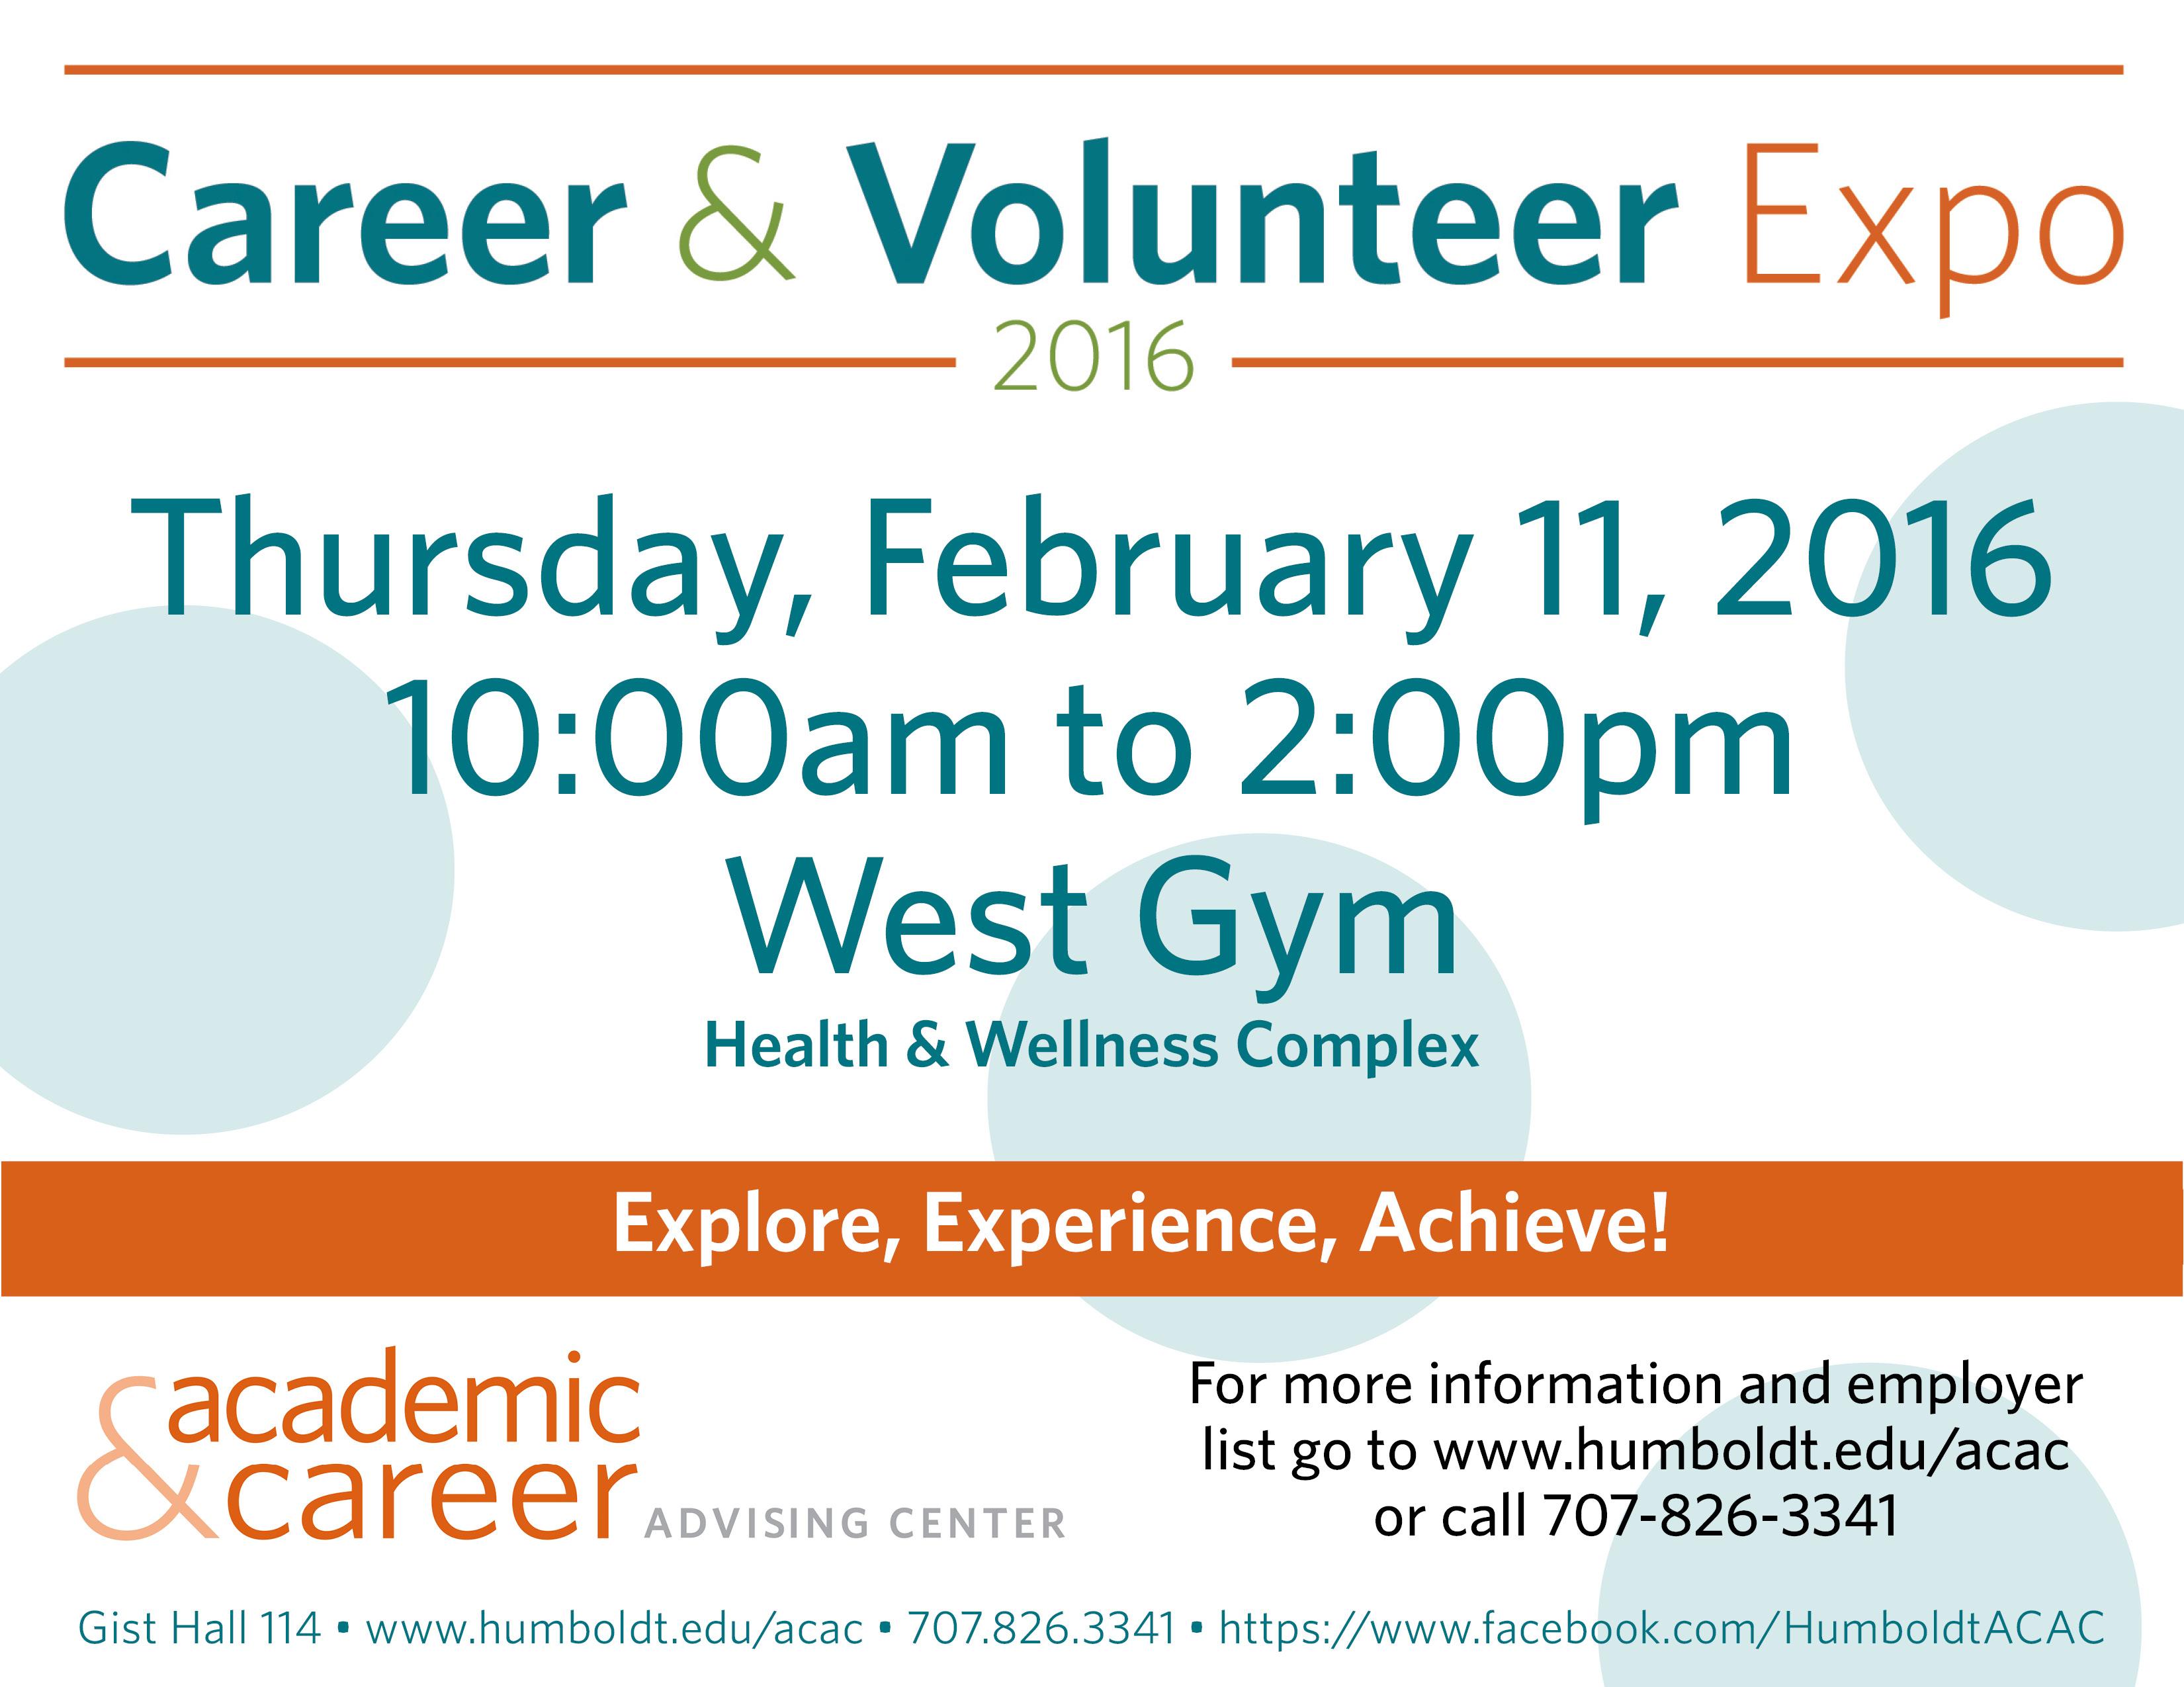 career volunteer expo myhumboldt message center humboldt career expo for monitors 2016 jpg